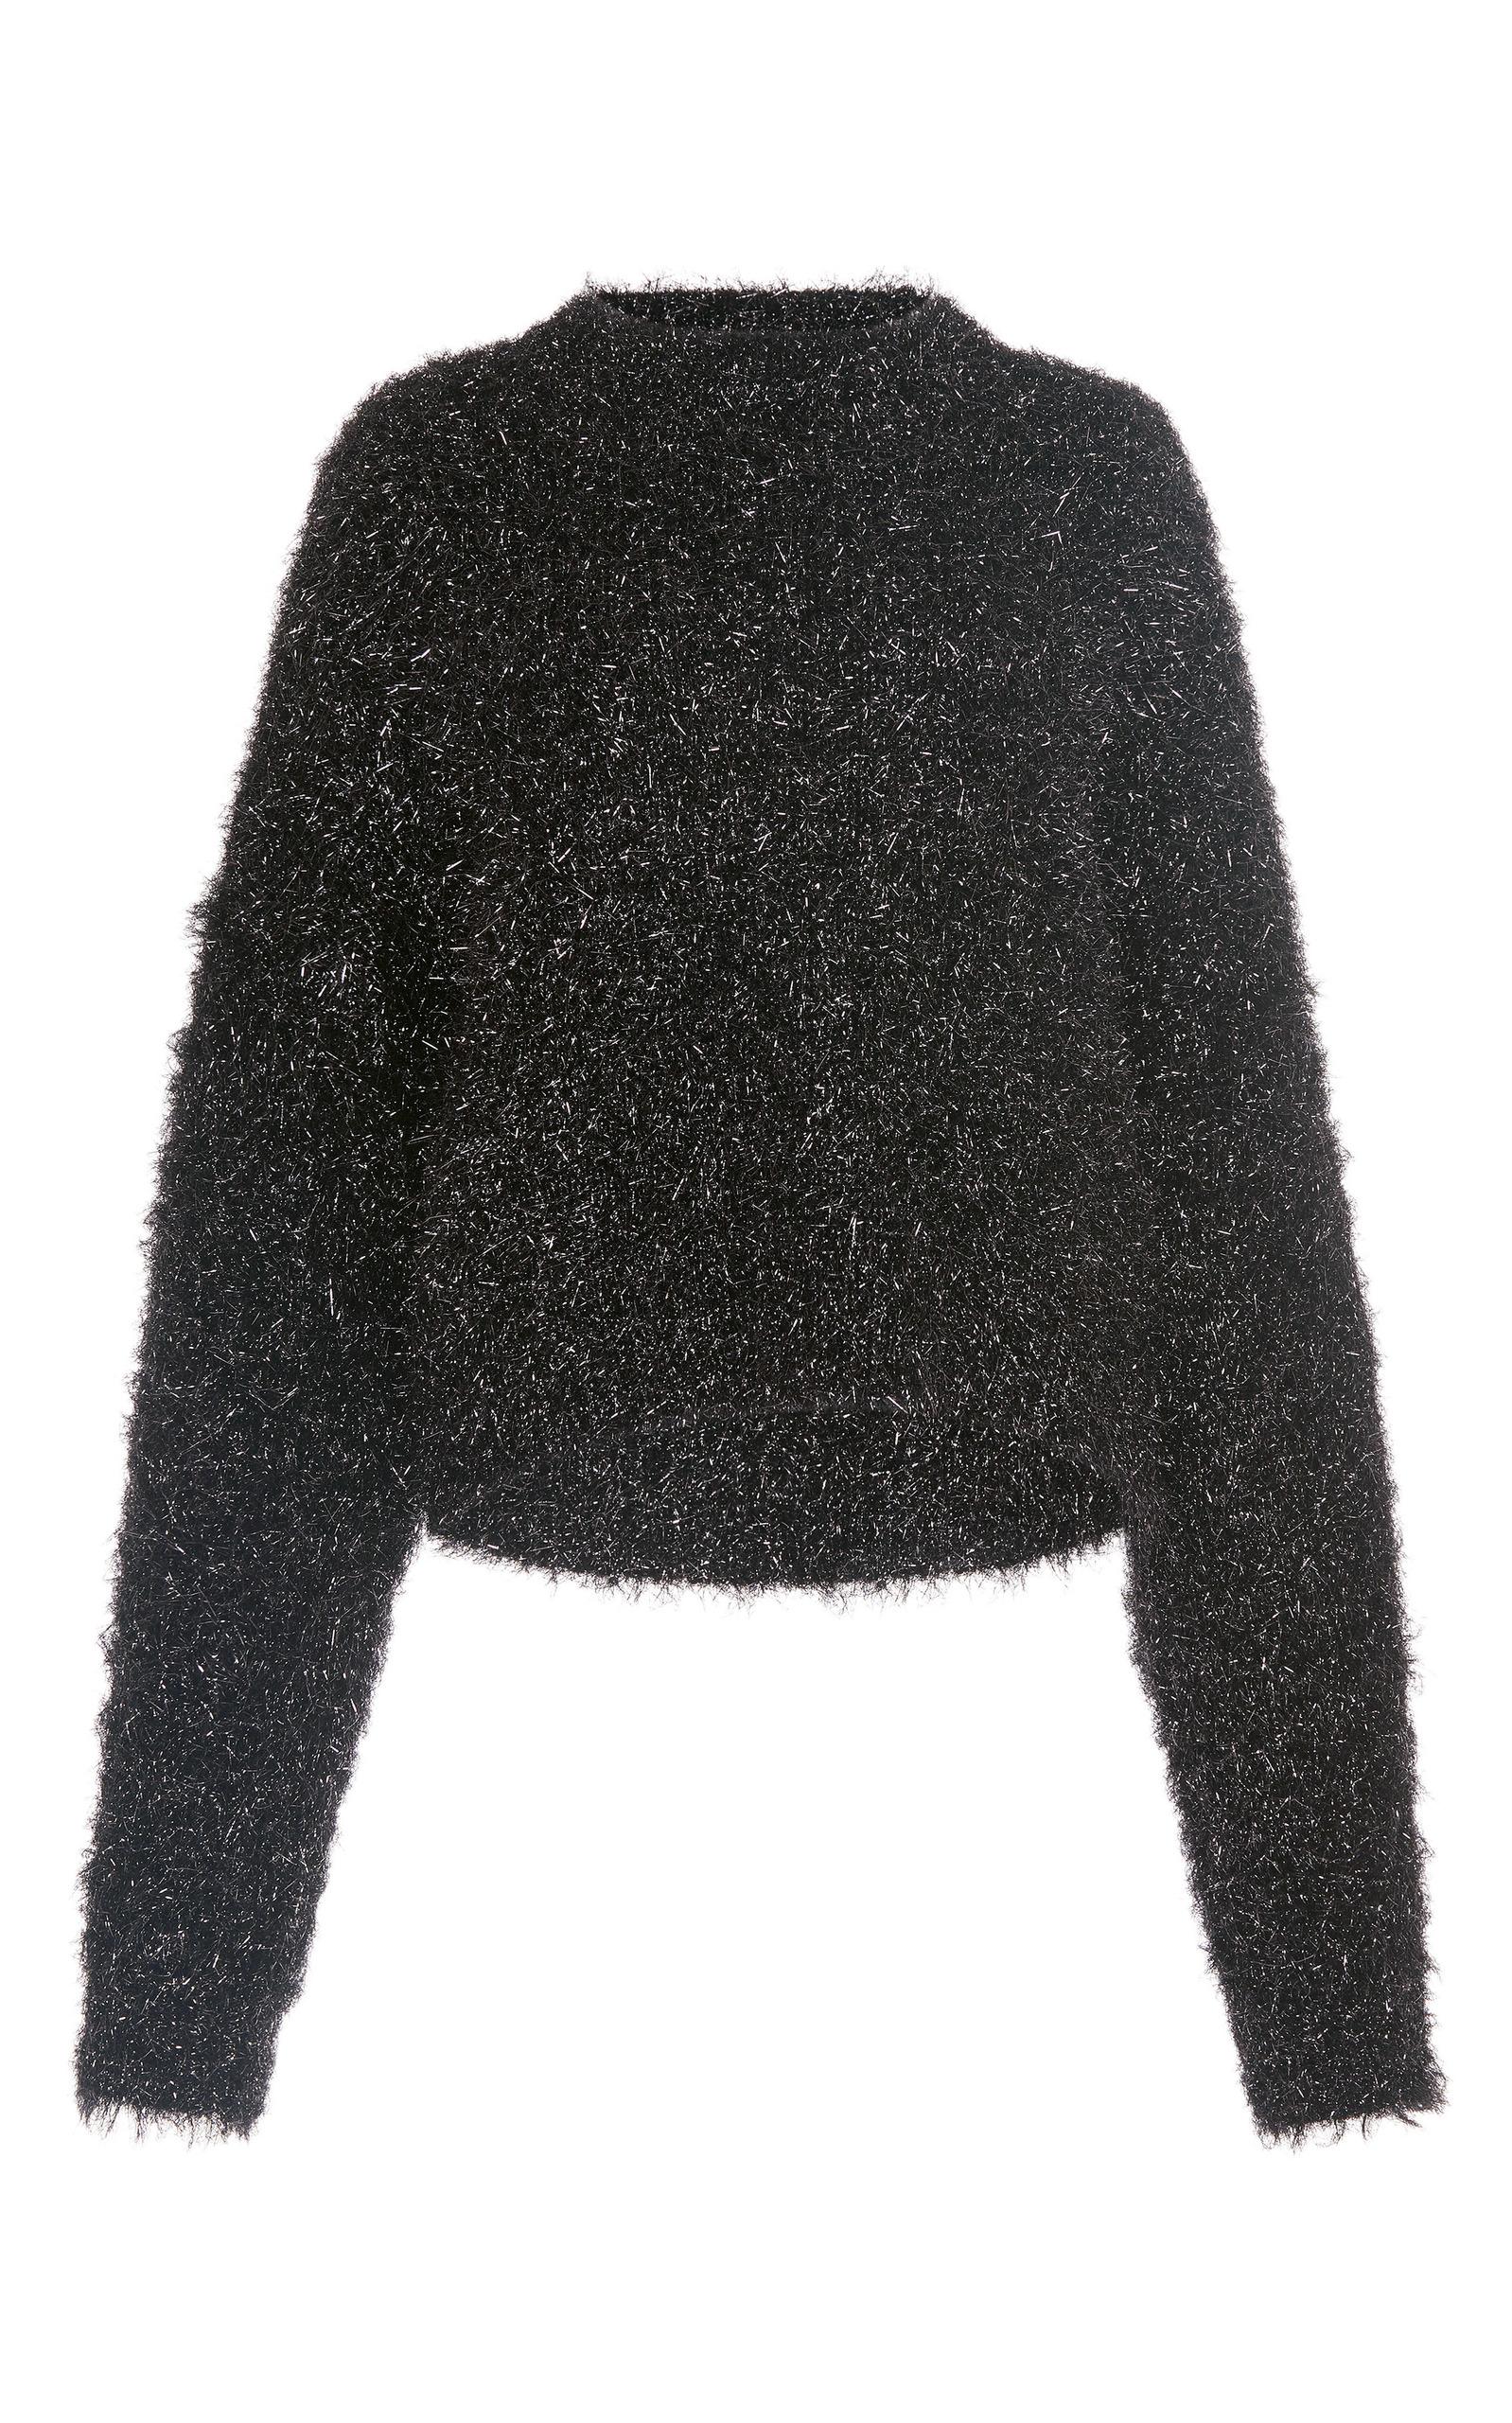 839b22301b Ben Furry Lurex Sweater by Isabel Marant